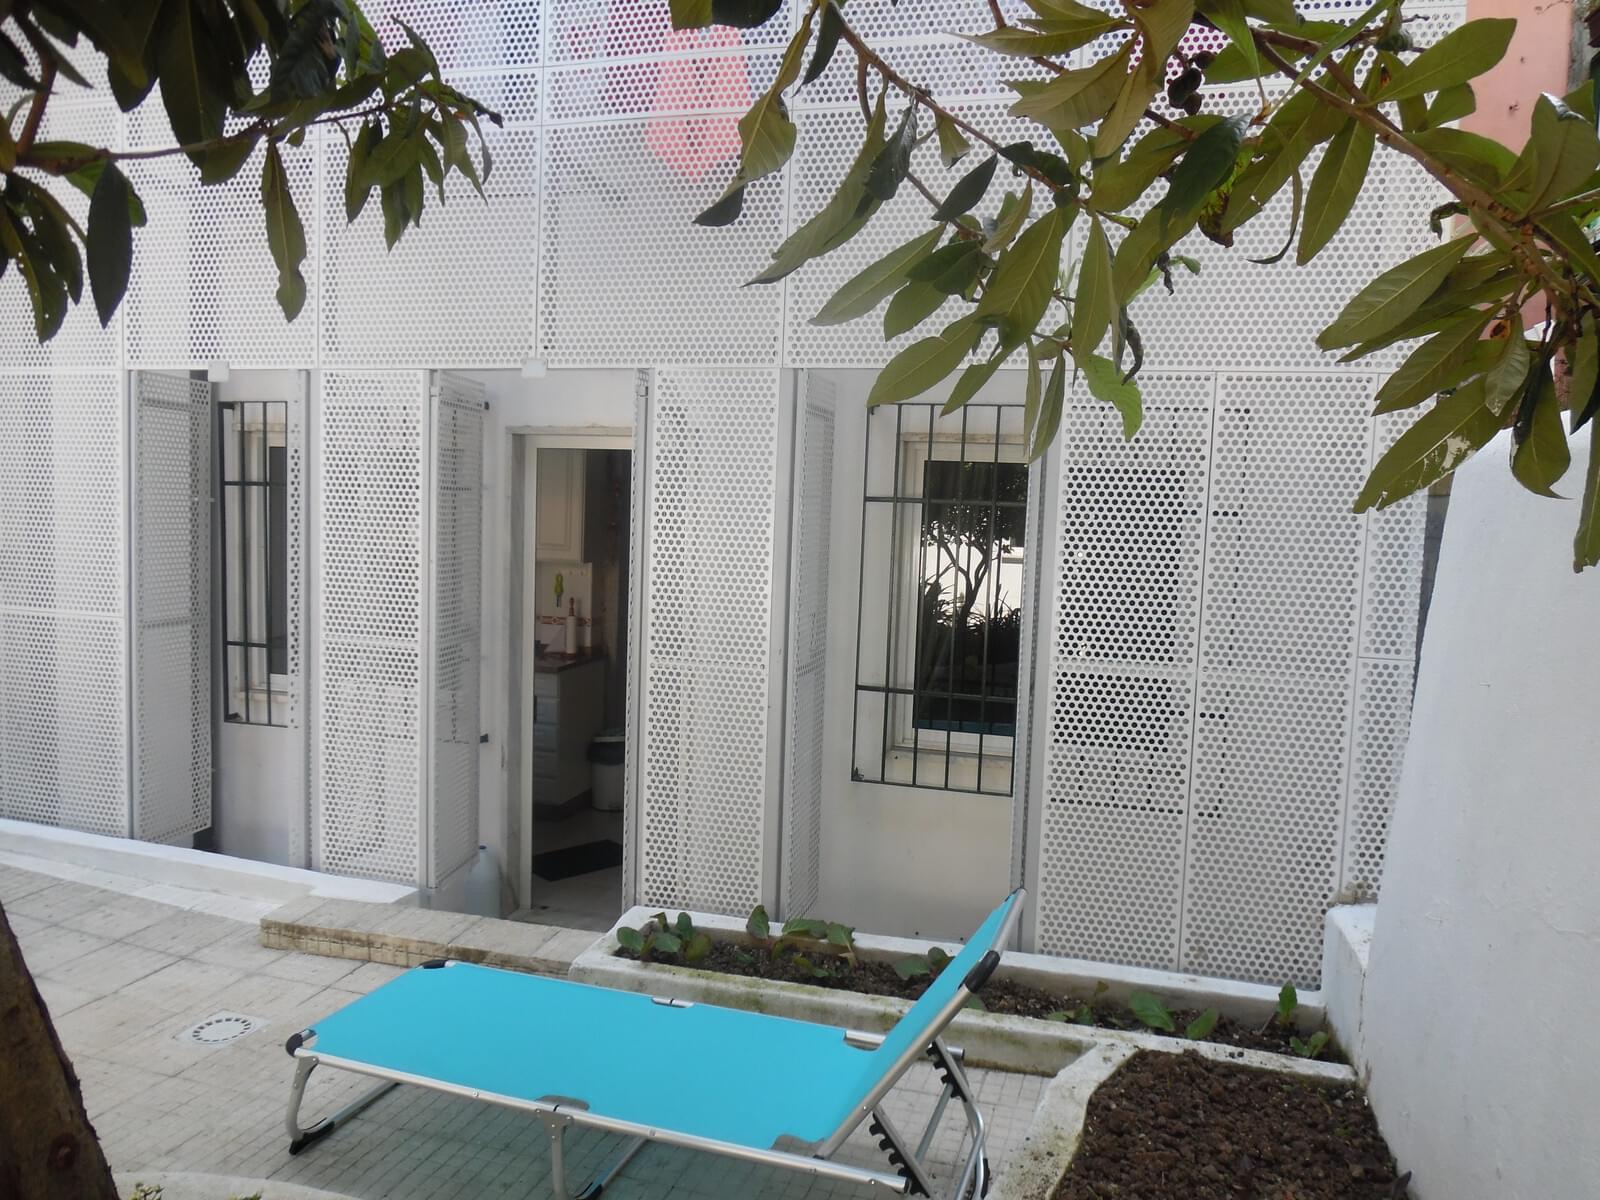 pf17147-apartamento-t2-lisboa-11f4607c-f187-44c3-9ae8-e846810f432d